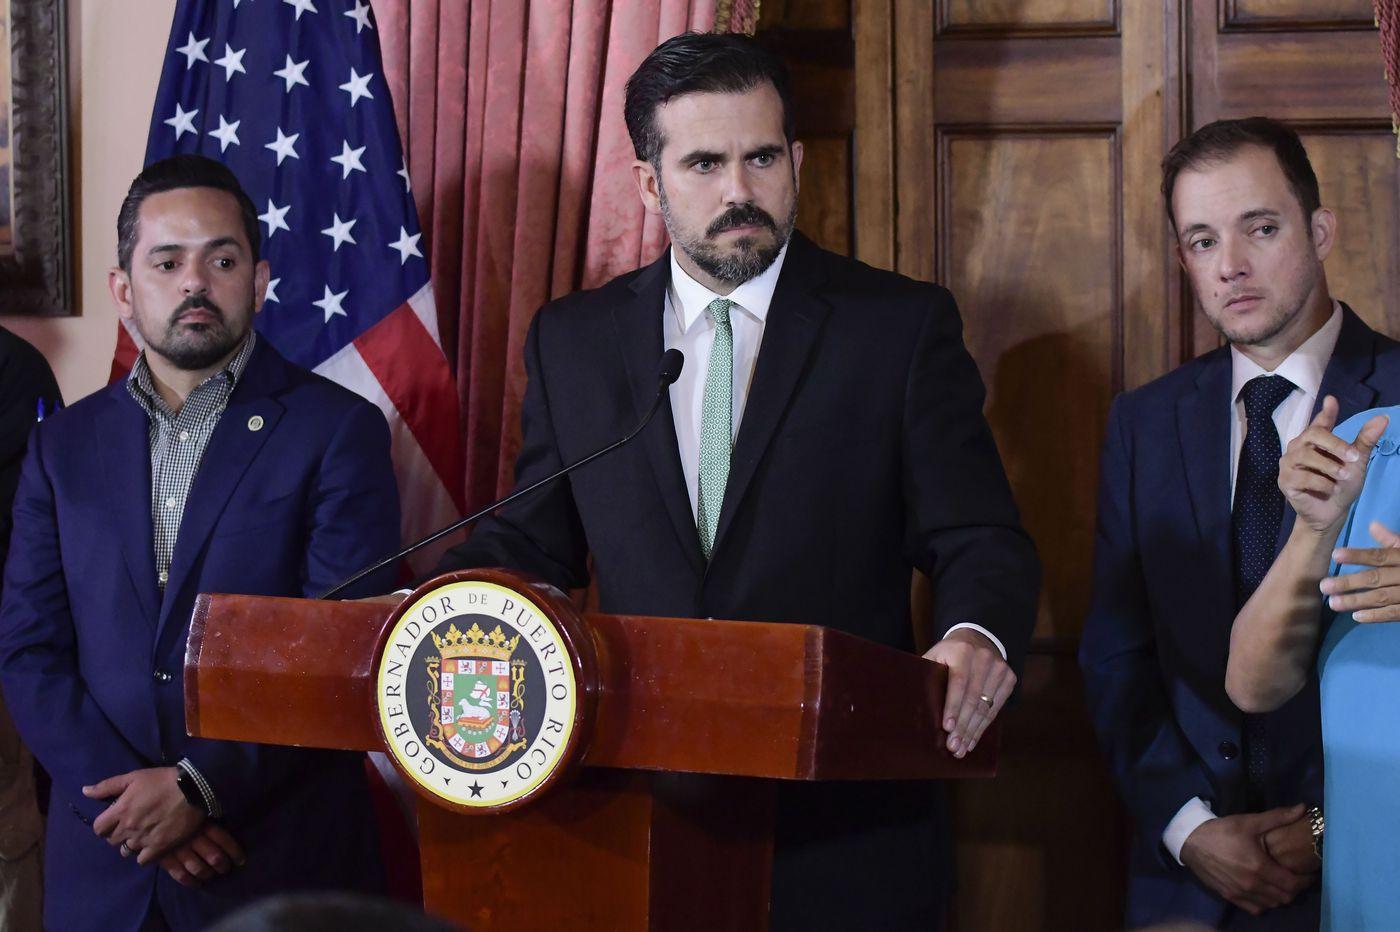 Puerto Rico Gov. Ricardo Rosselló Ousted Amid Public Outcry